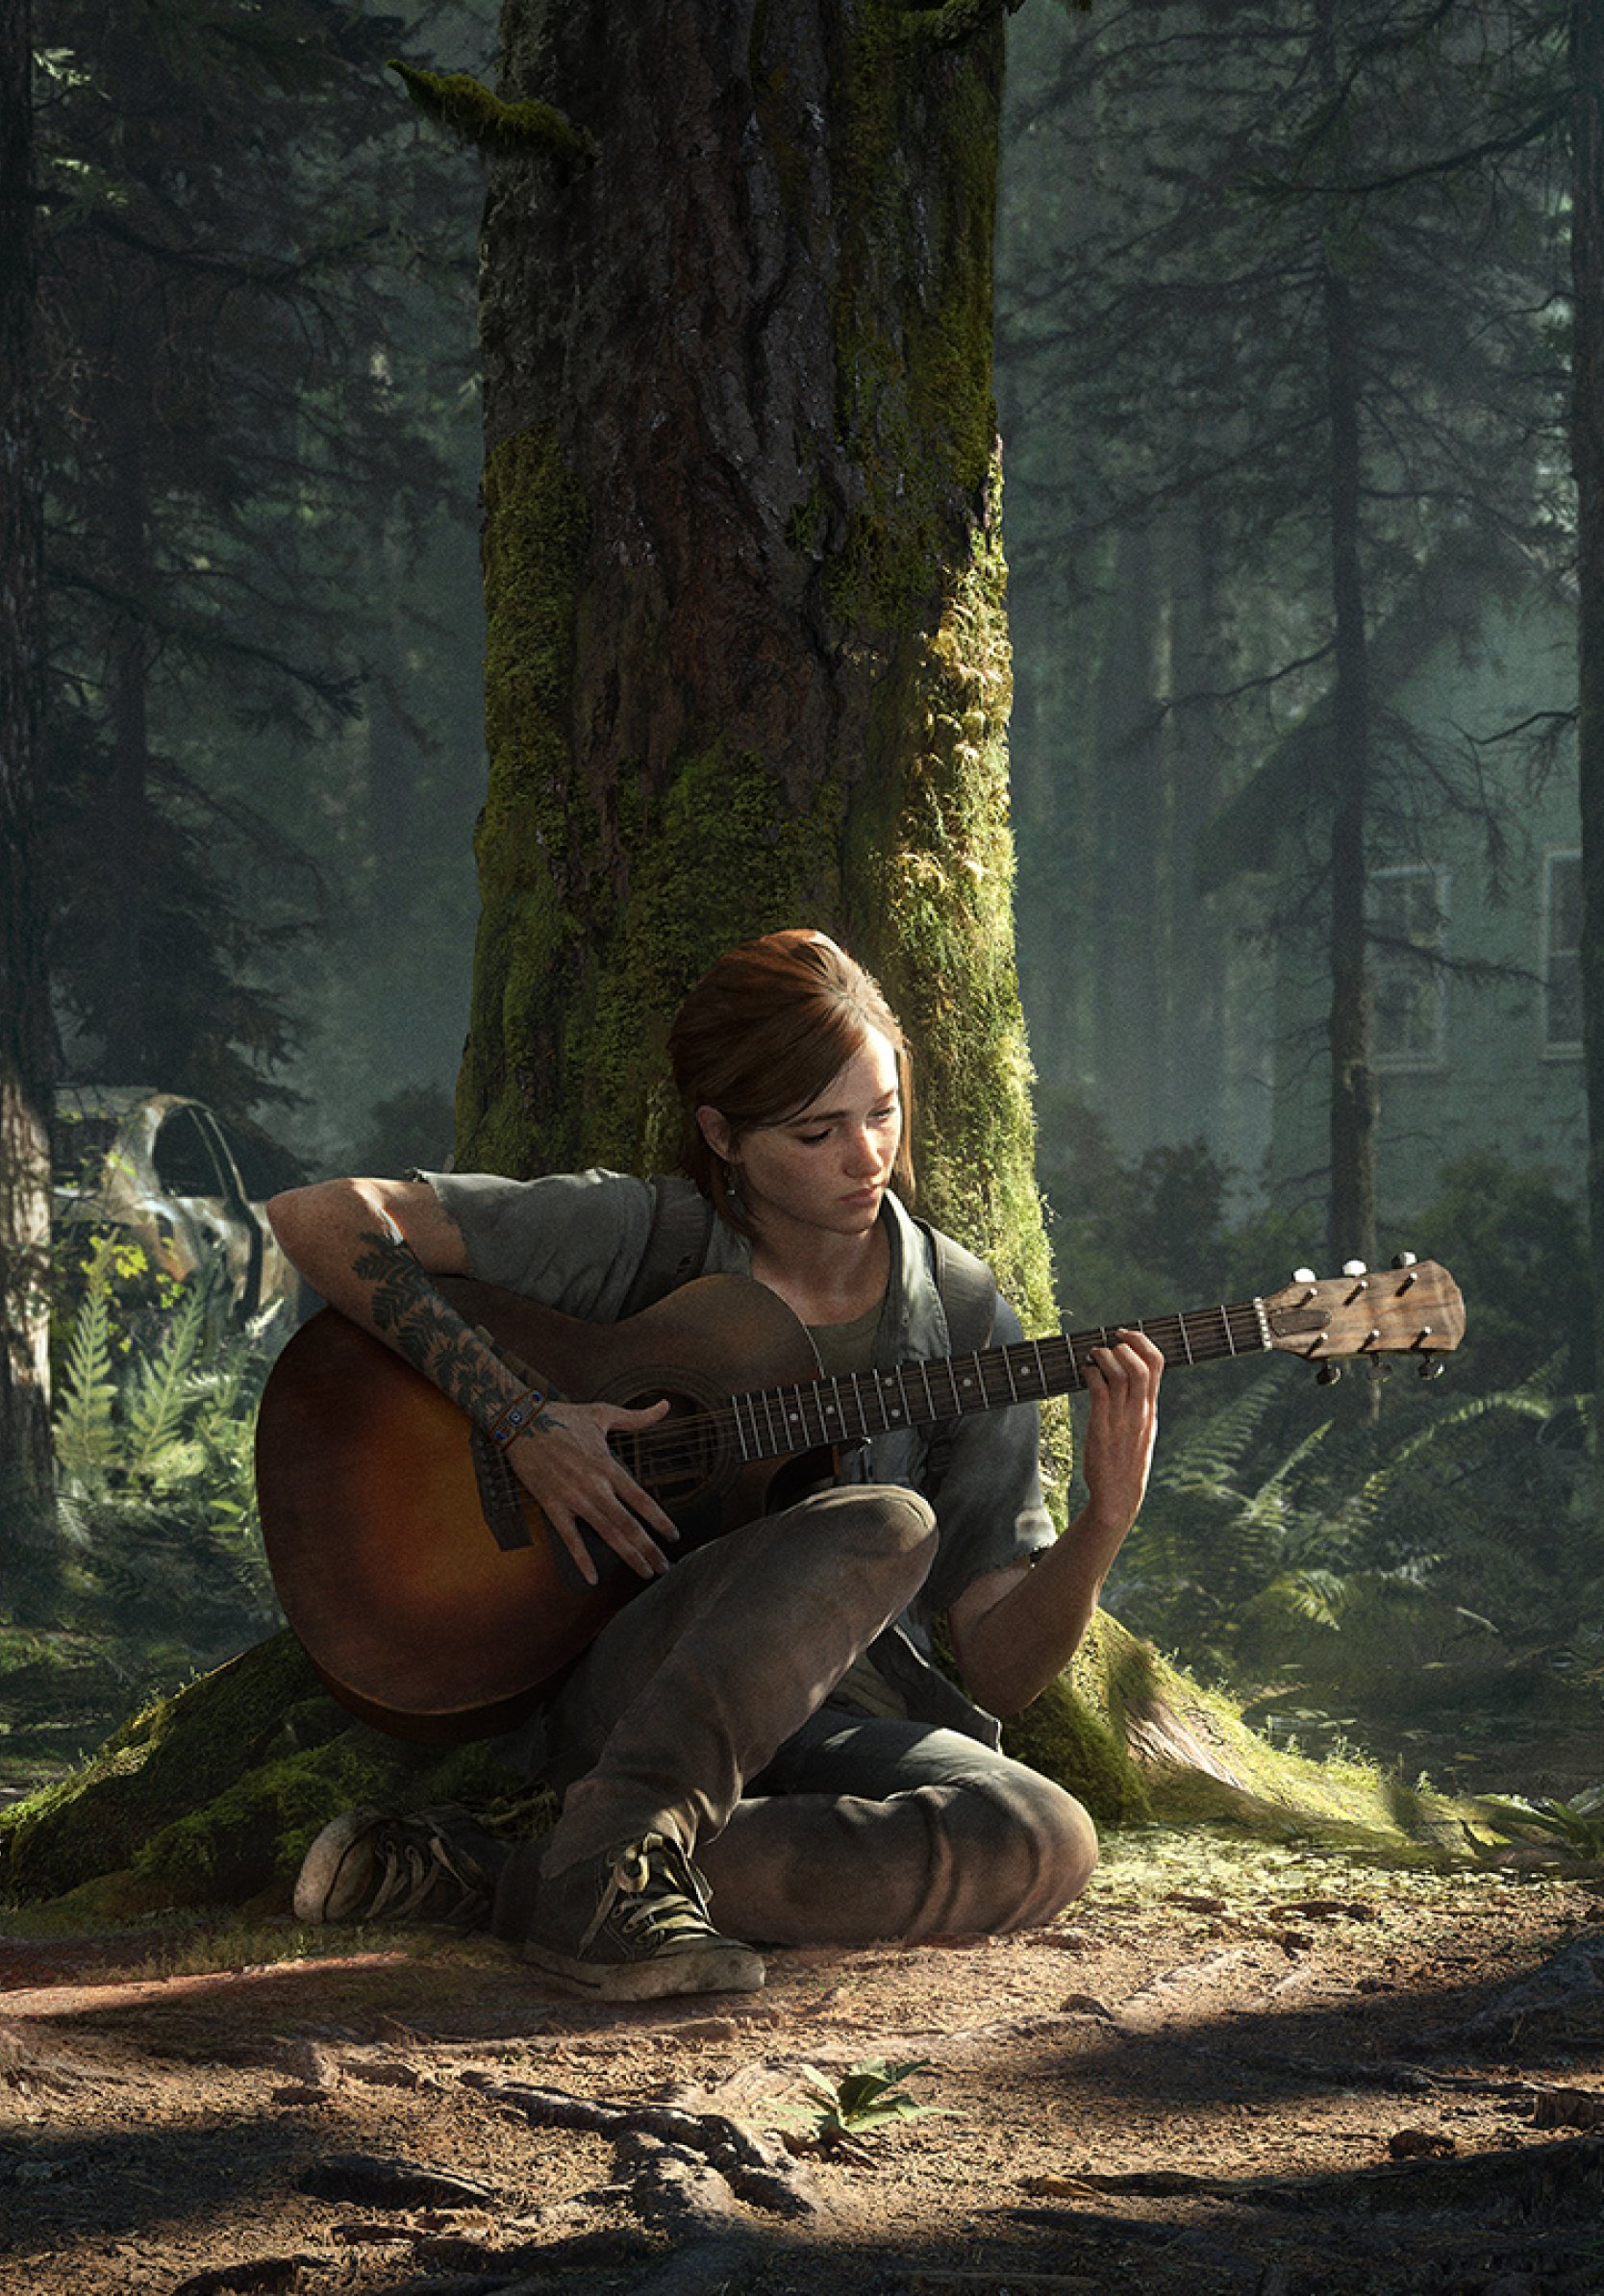 1668x2388 Ellie The Last of Us 2 1668x2388 Resolution Wallpaper 1668x2388